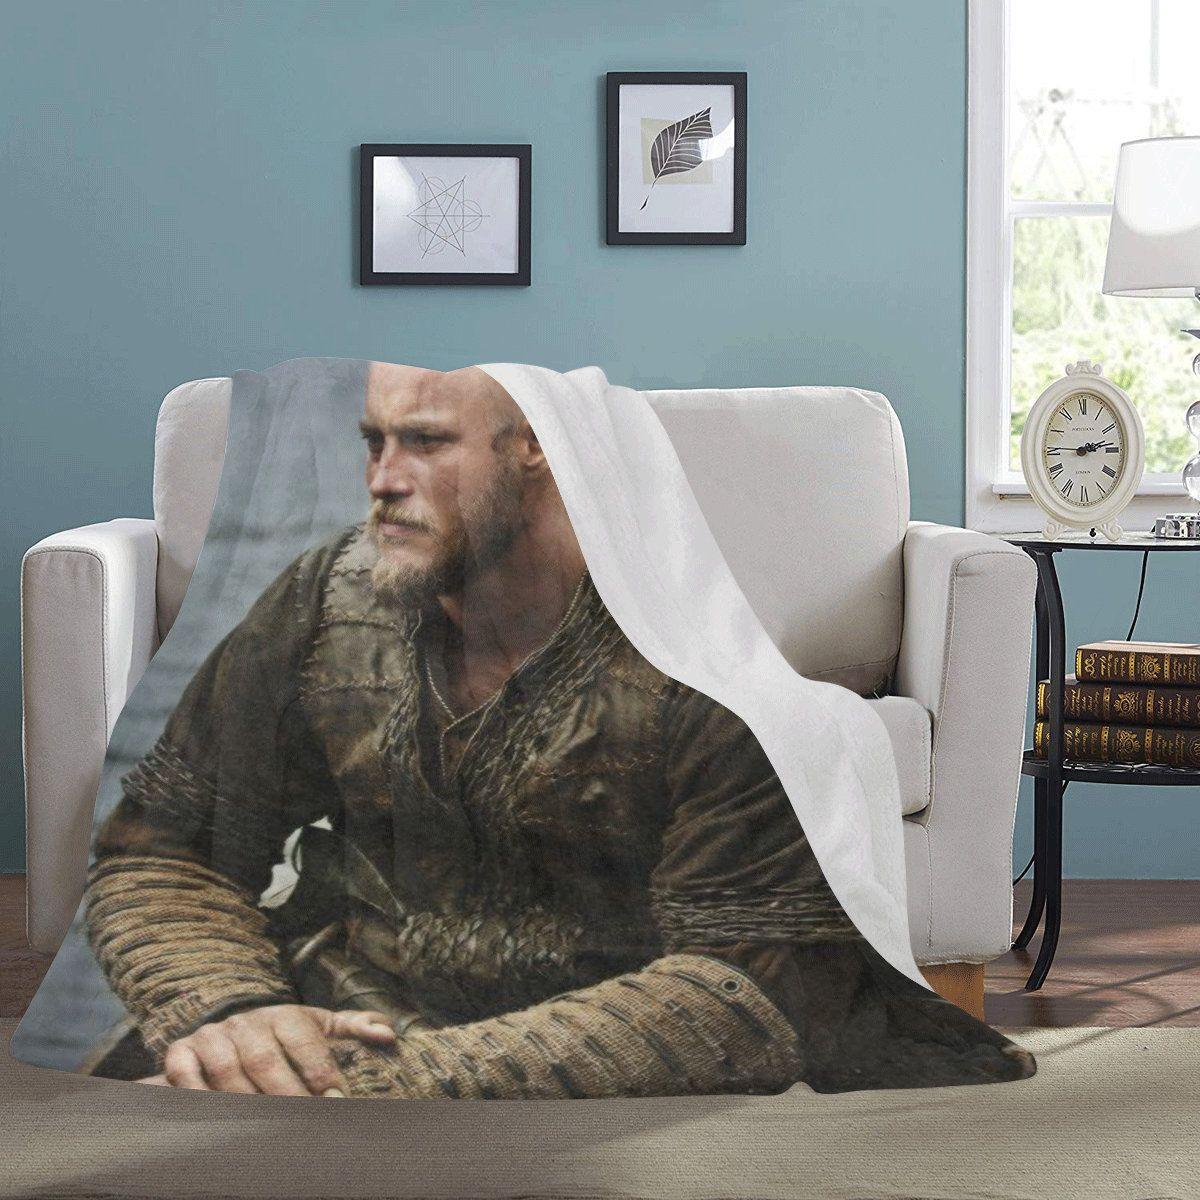 Ragnar Lothbrok Blanket Cozy Vikings Micro Fleece Anniversary Gifts For Her Him Birthday Custom Personalised by UniquegiftsByMaria on Etsy